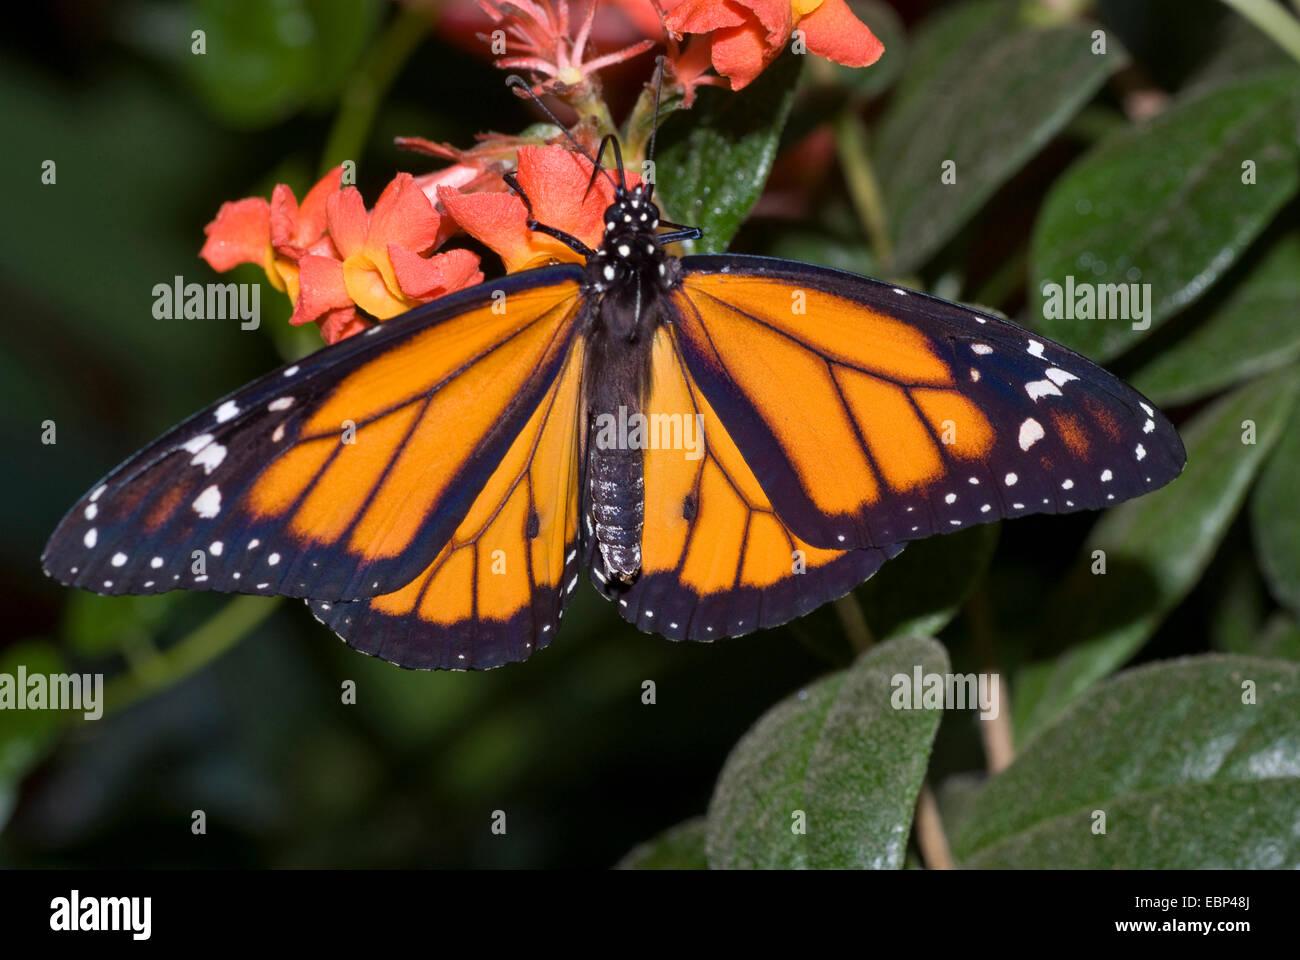 monarch butterfly, milkweed (Danaus plexippus), on orange flowers - Stock Image